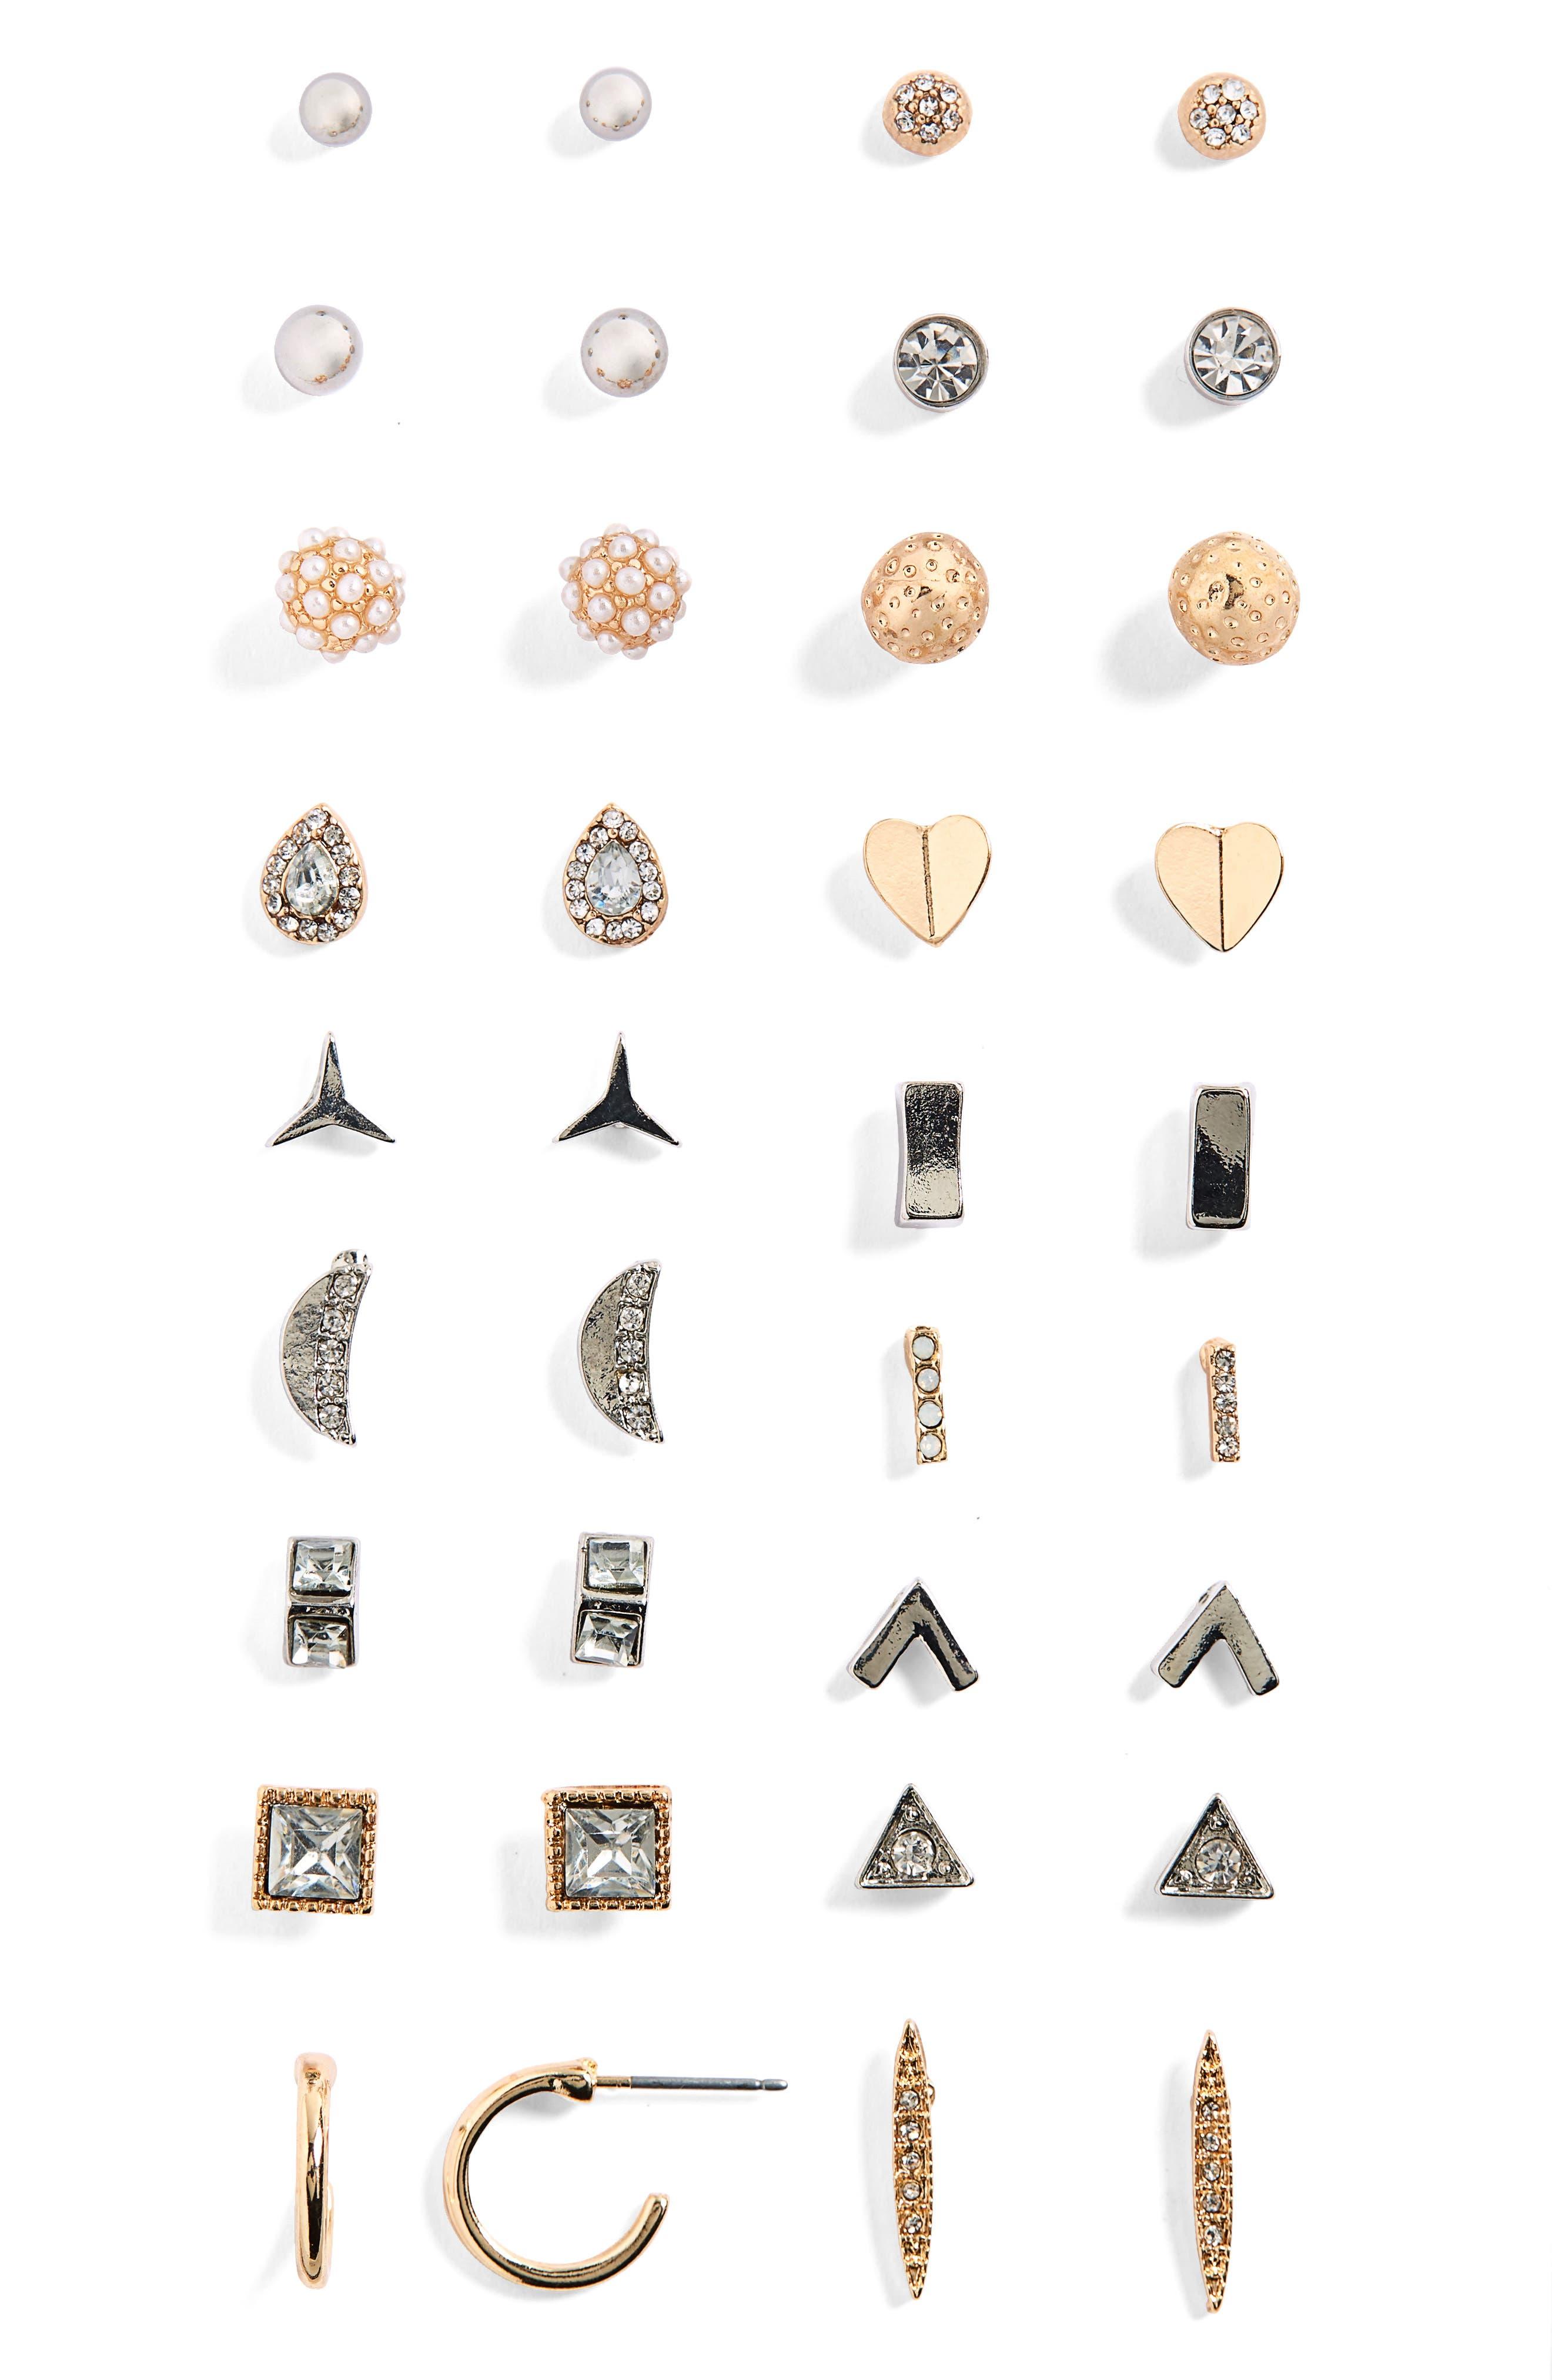 18-Pack Imitation Pearl & Crystal Stud Earrings,                             Main thumbnail 1, color,                             710